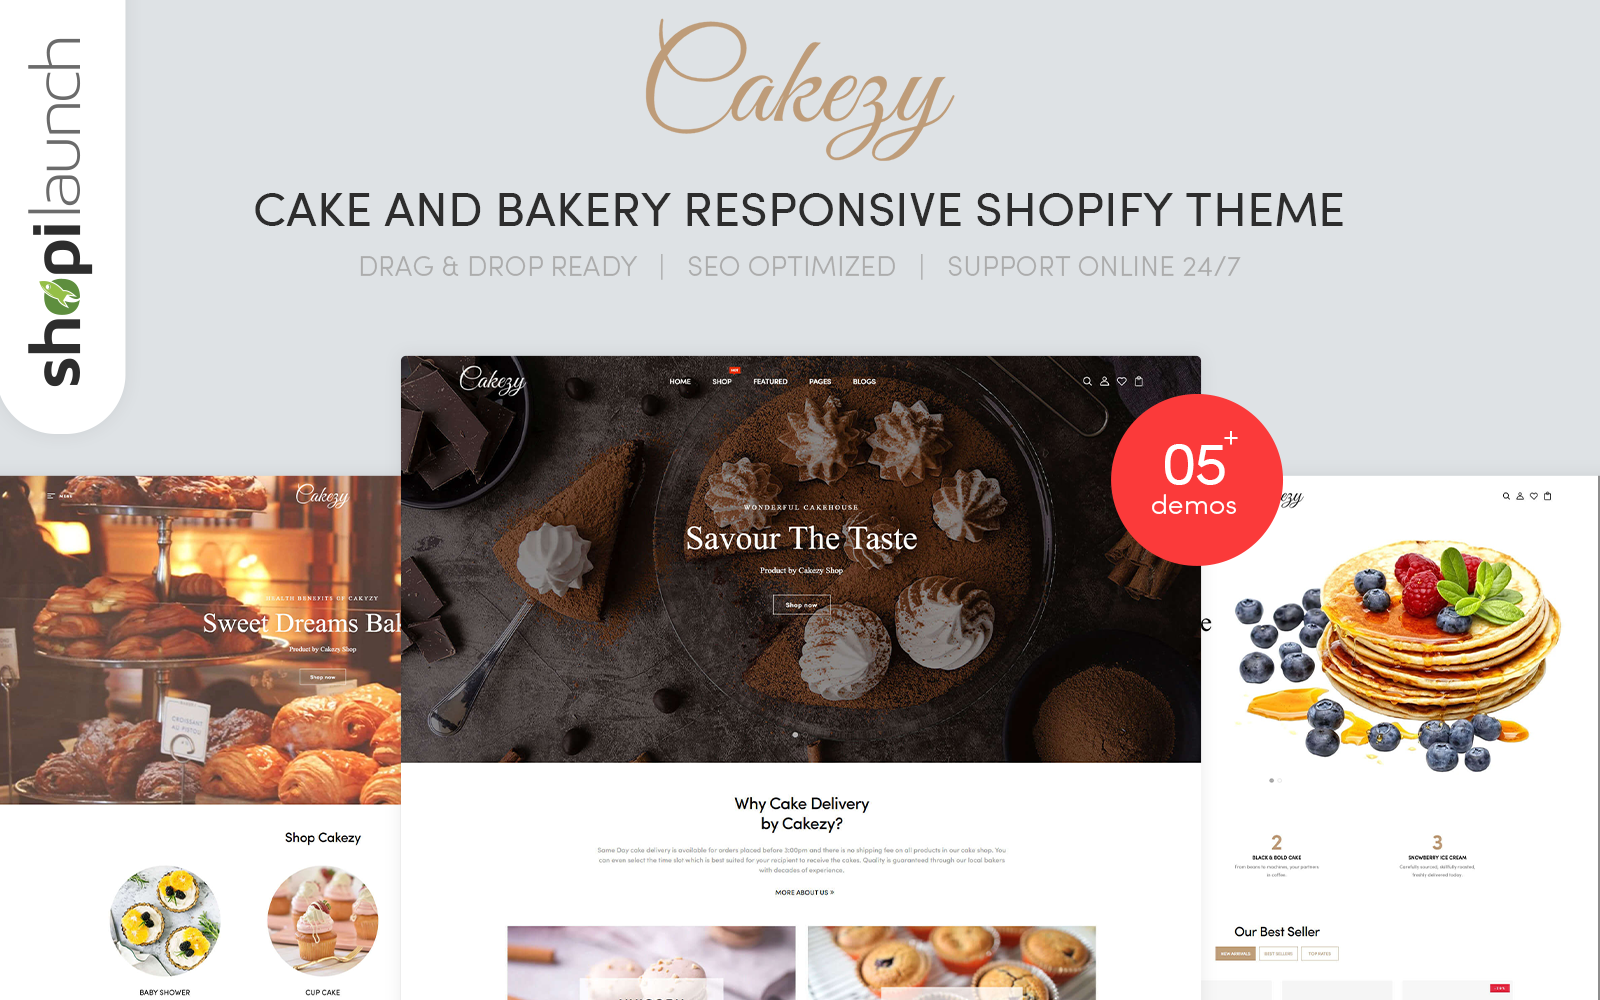 Cakezy - Cake & Bakery Responsive Shopify Theme